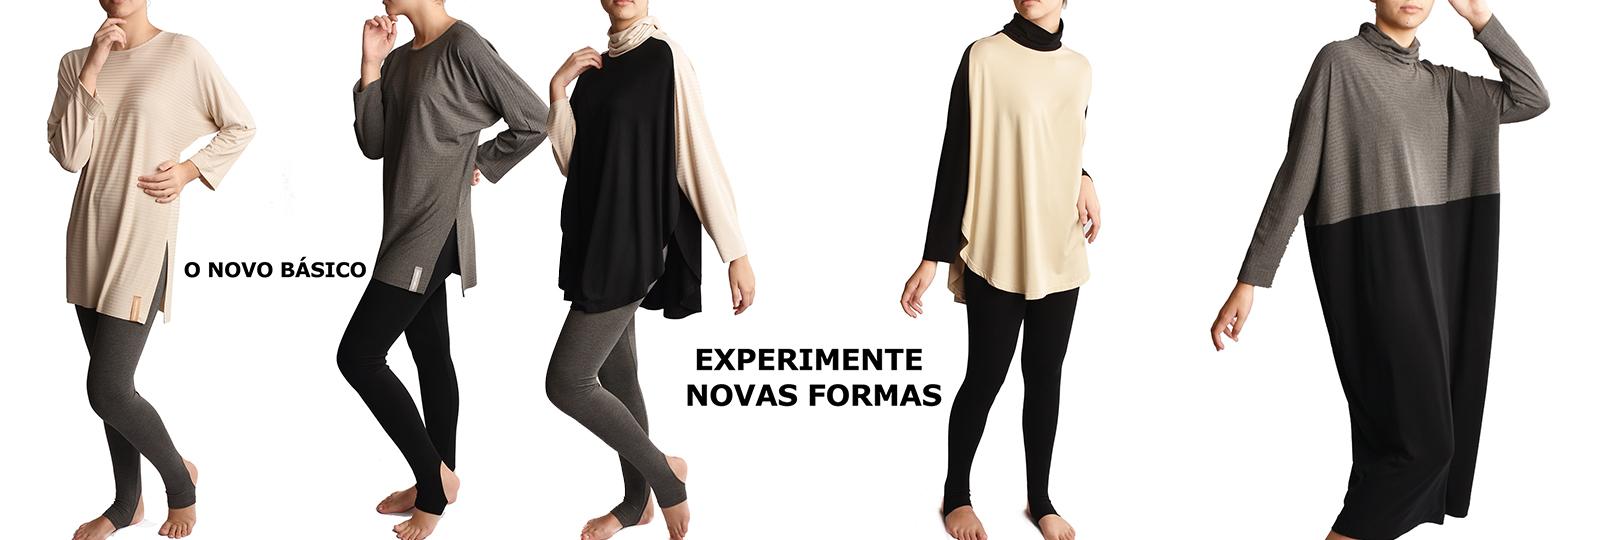 O Novo Basico Usenatureza Confortwear